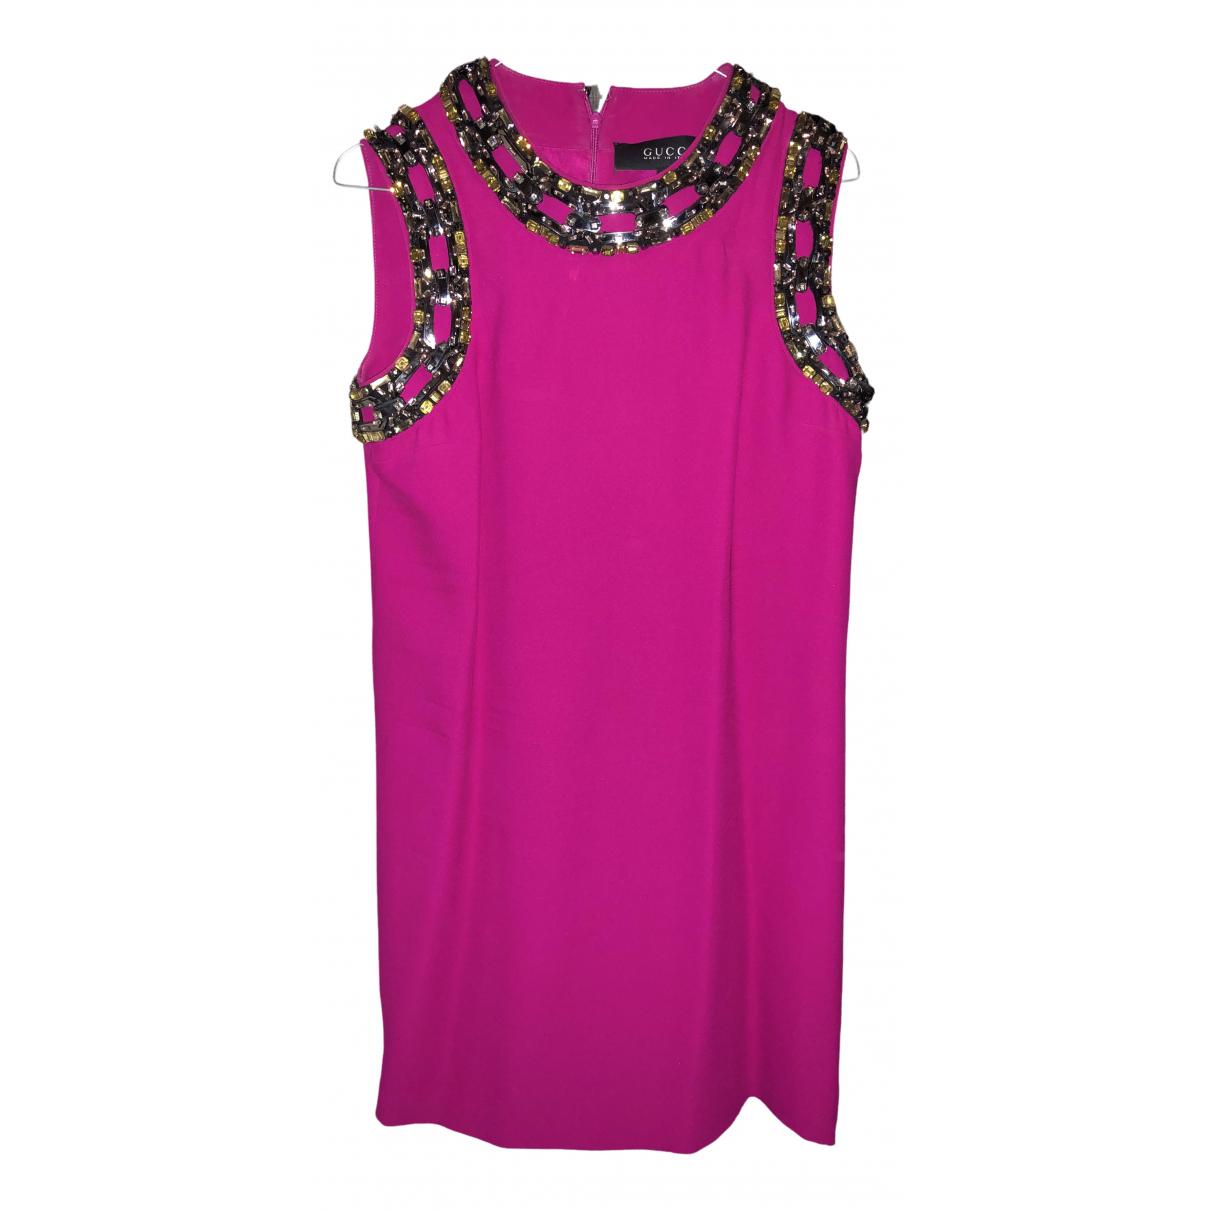 Gucci \N Pink dress for Women 42 IT